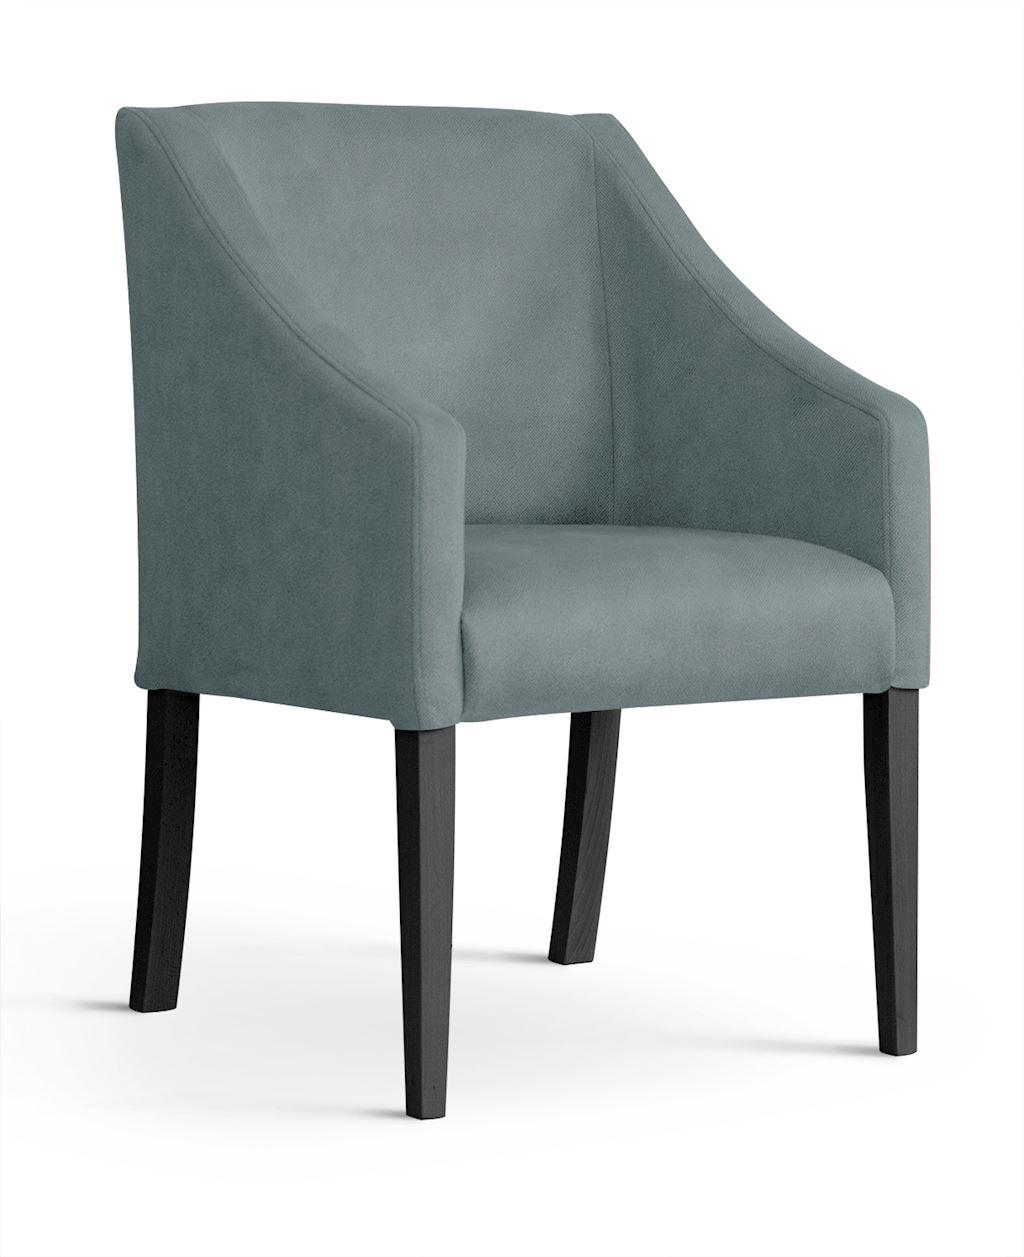 Fotoliu fix tapitat cu stofa, cu picioare din lemn Capri Grey / Black, l58xA60xH89 cm imagine